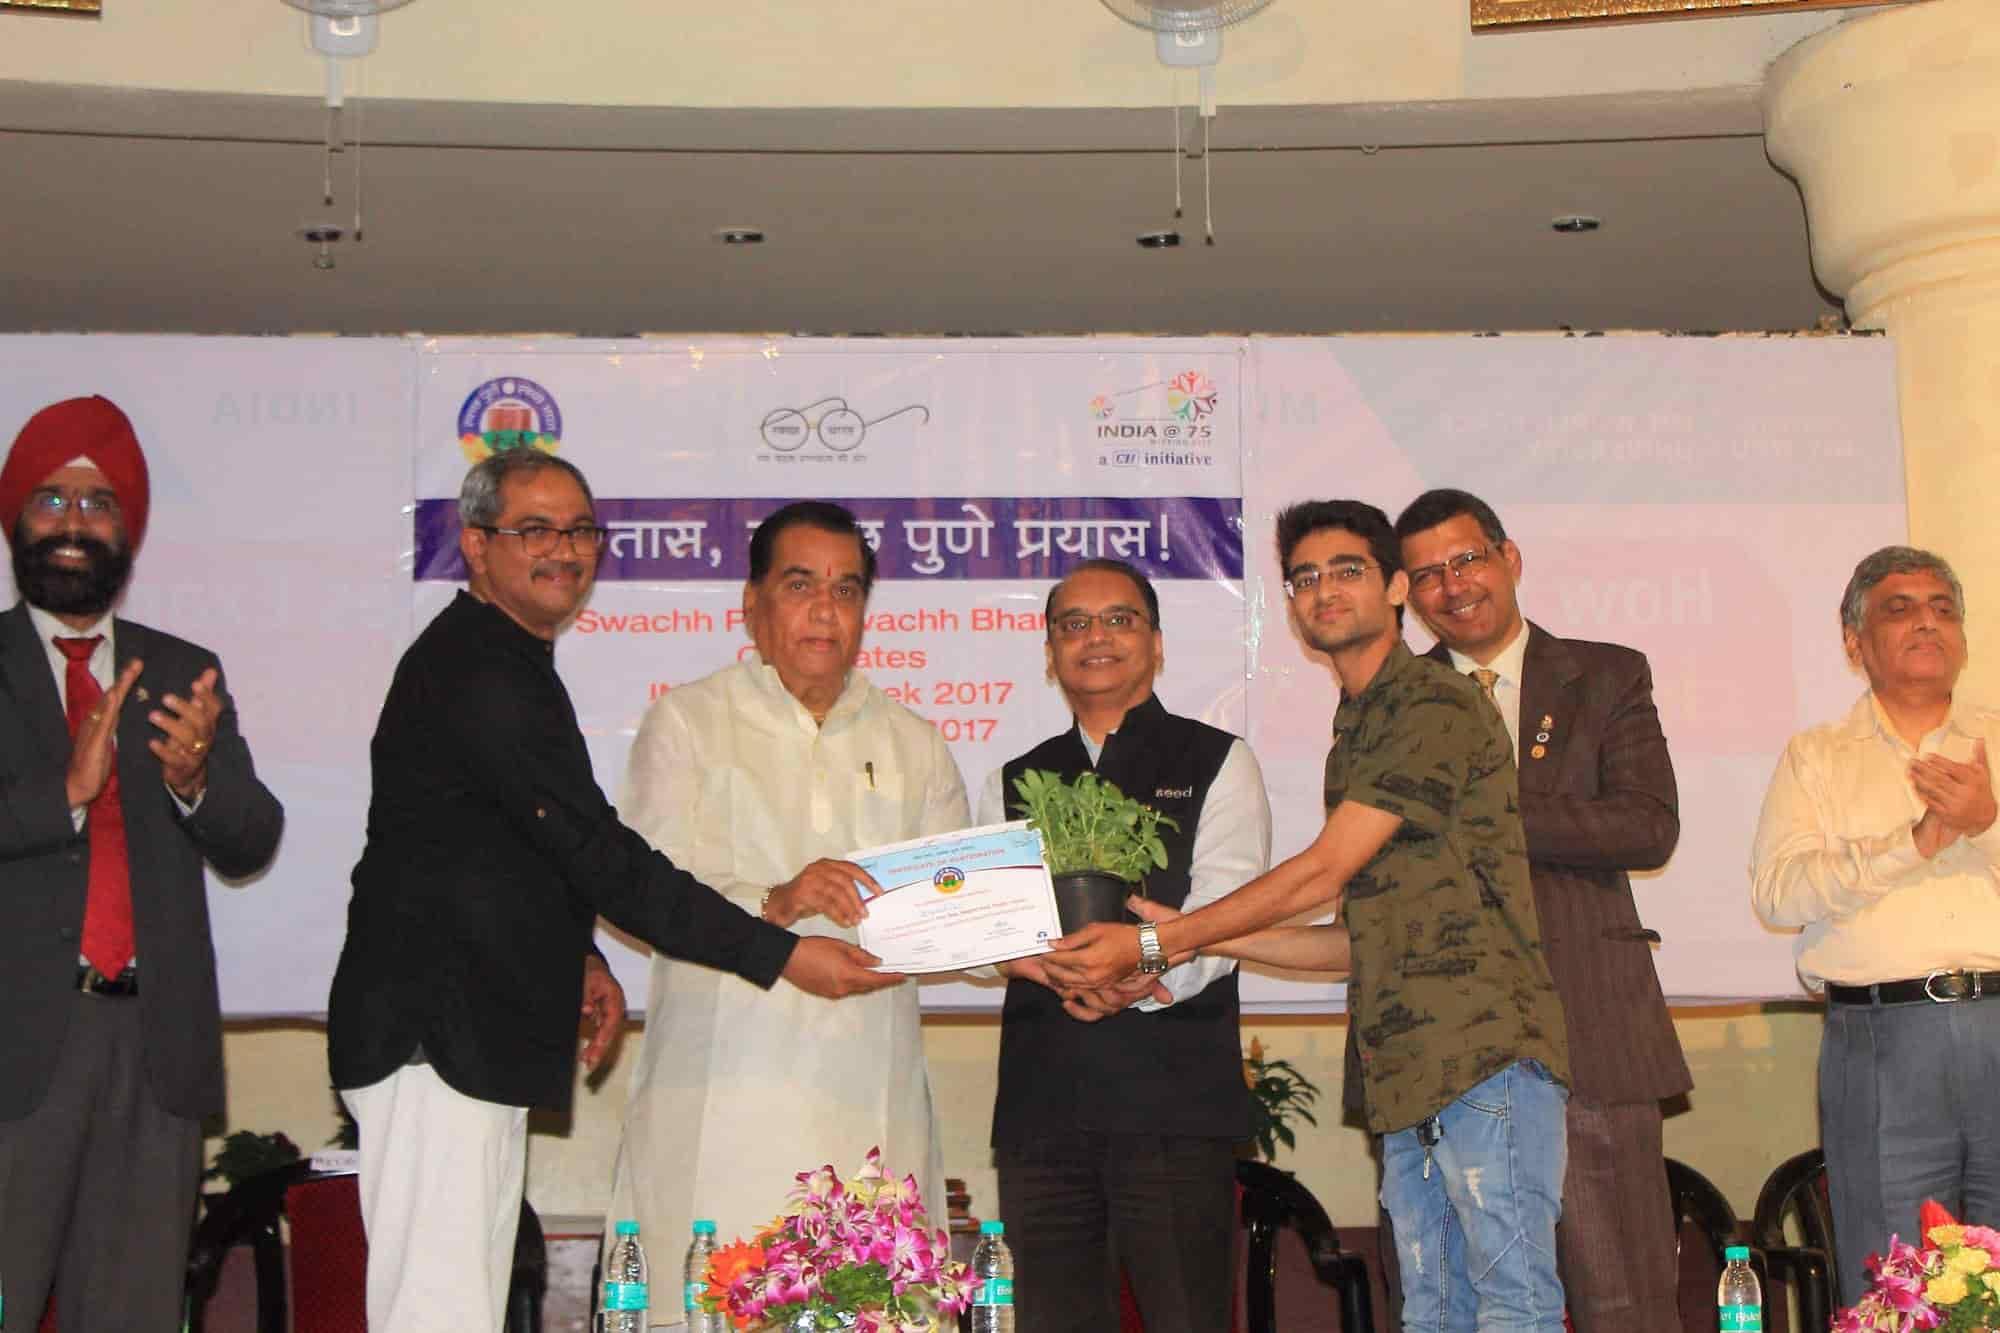 Vibgyor Foundation, Parvati - NGOS in Pune - Justdial